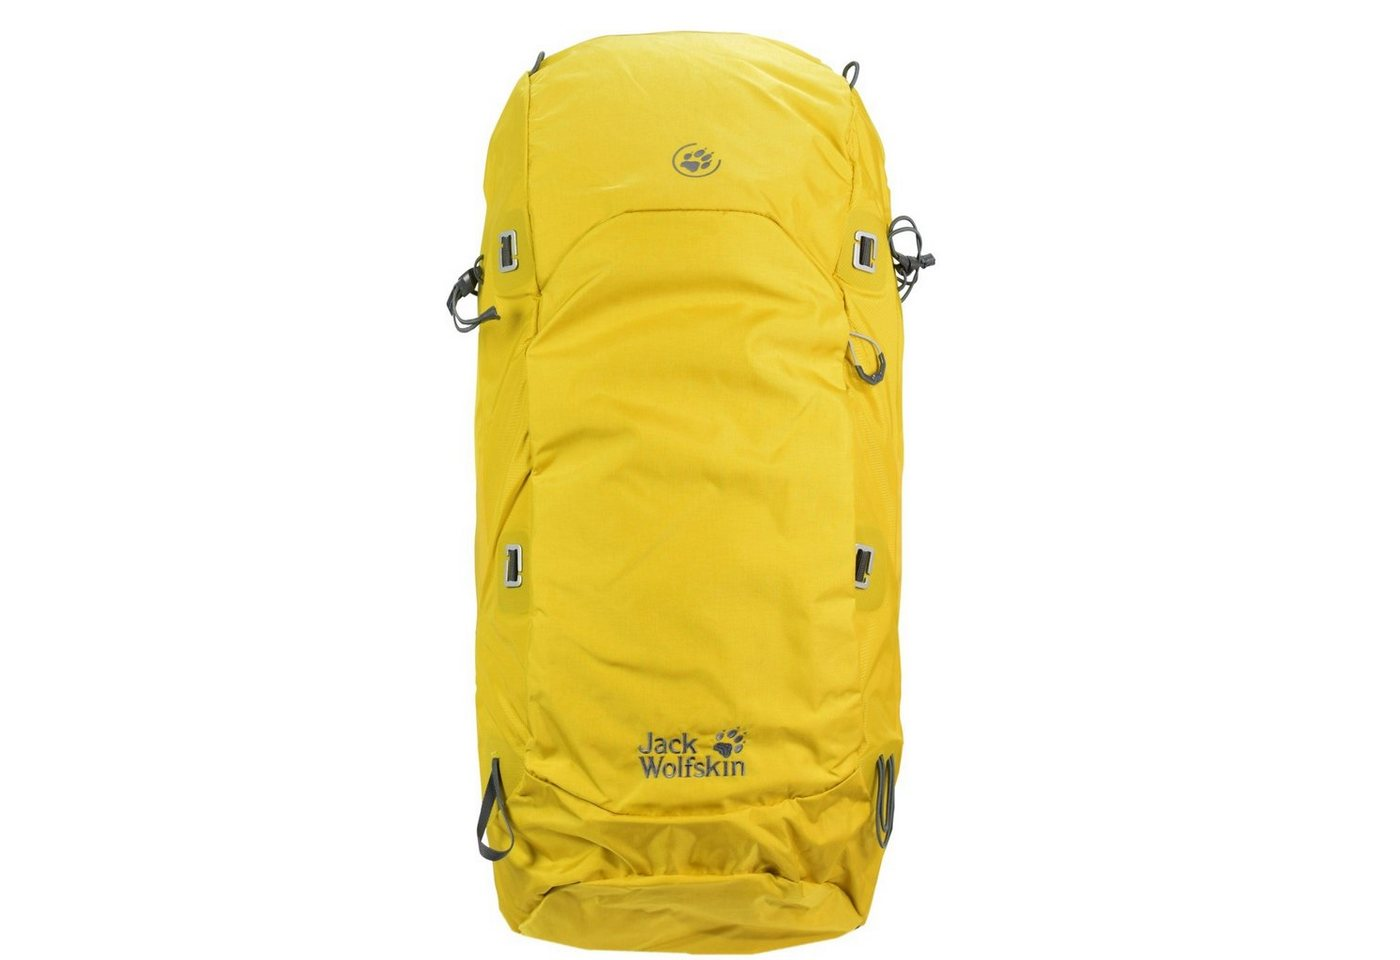 Klein Döbbern Angebote Jack Wolfskin Daypacks & Bags EDS Dynamic Pro 38 Pack Rucksack 70 cm